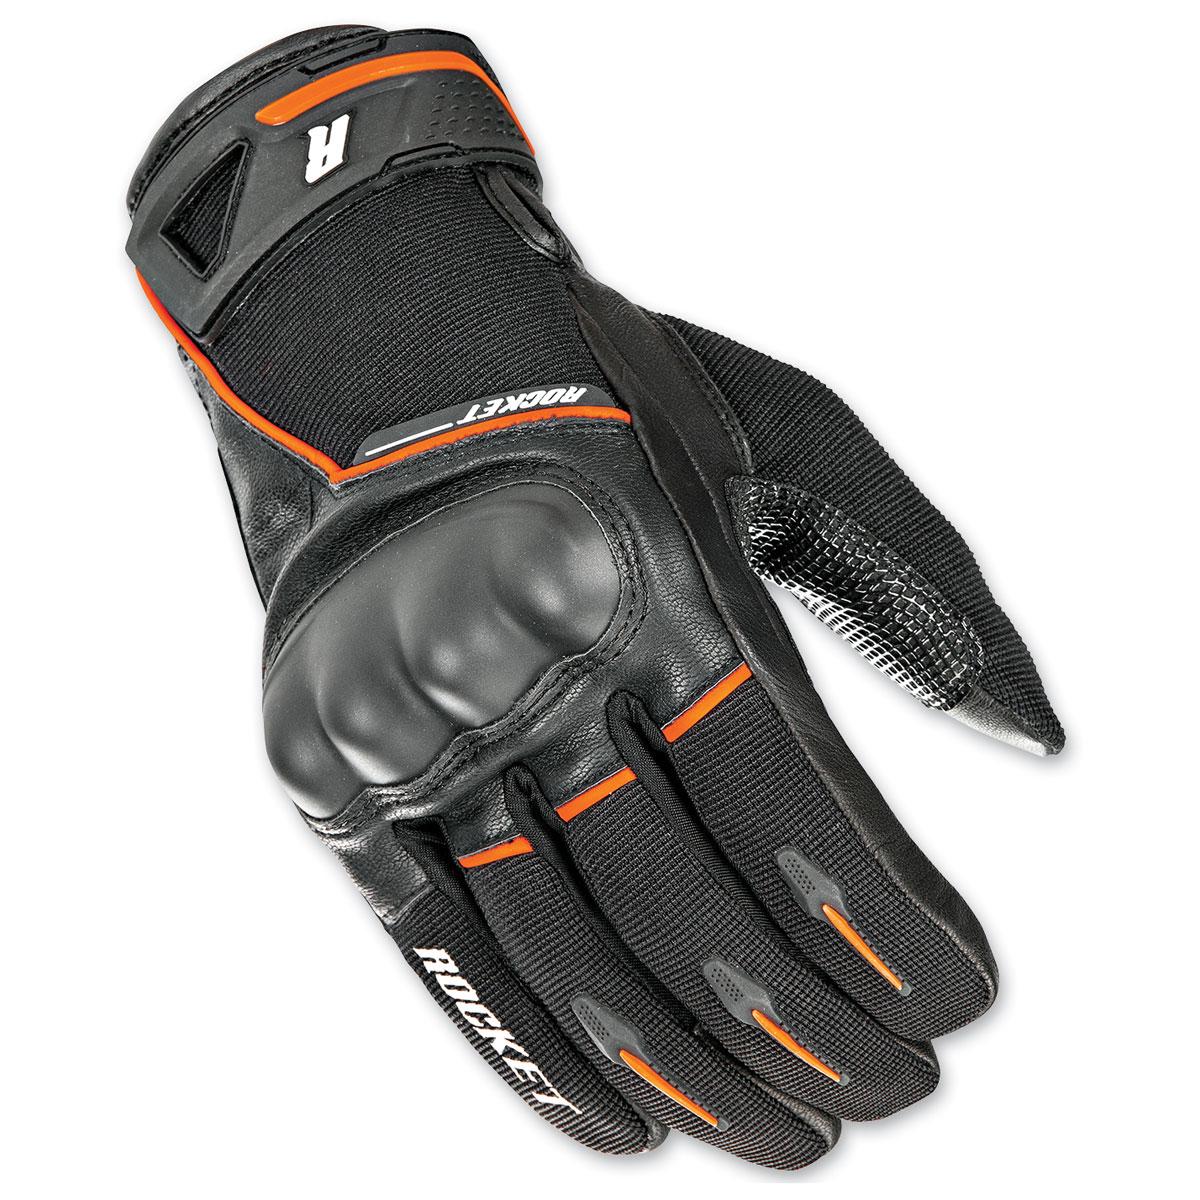 Joe Rocket Men's Super Moto Black/Orange Gloves